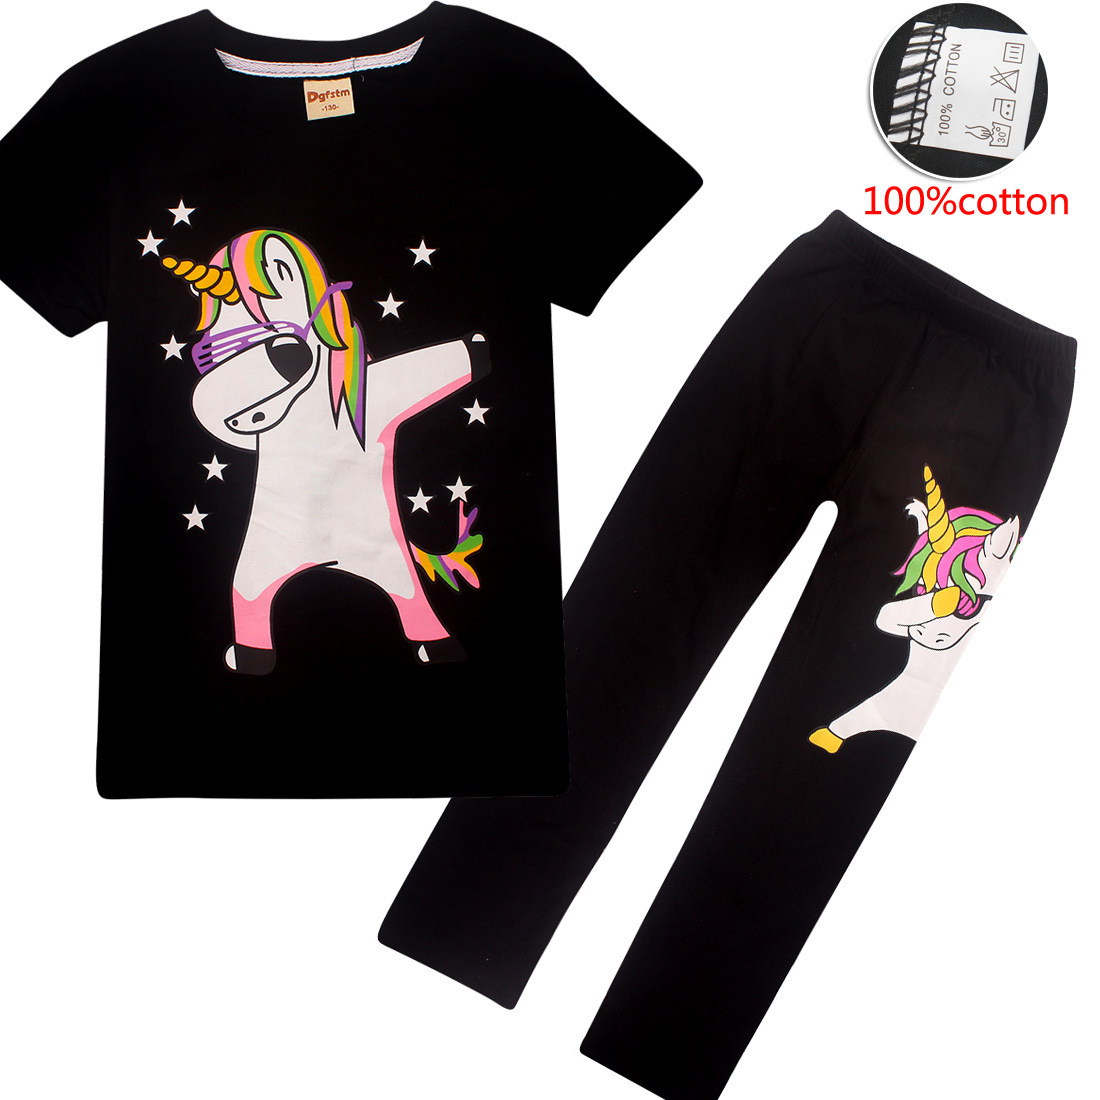 Arsenal FC Official Football Gift Girls Boys Kids Kit Pyjamas Night Suit 4-12Y